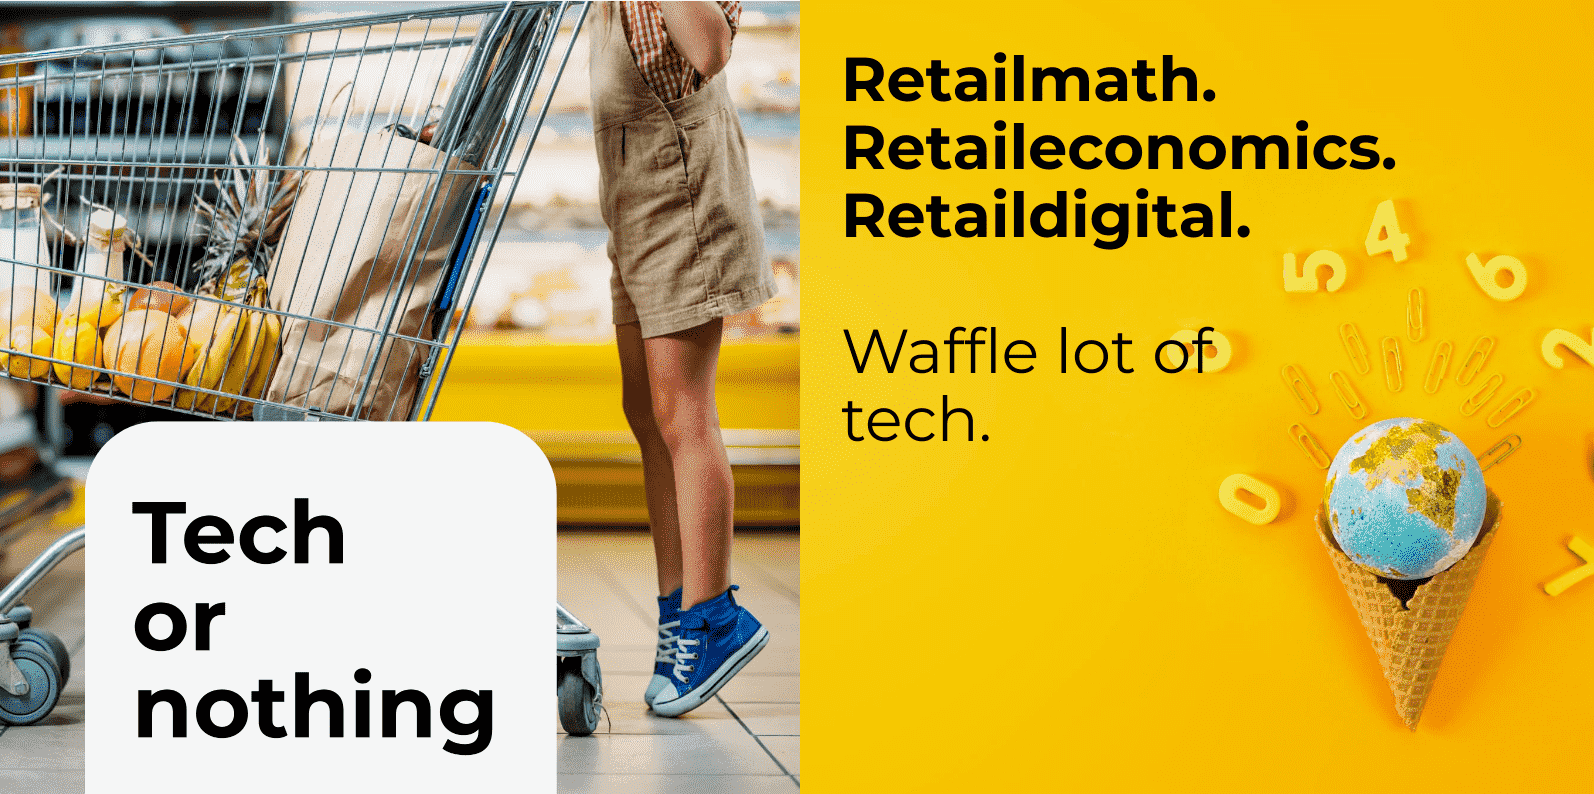 omnichannel retail strategy 2021